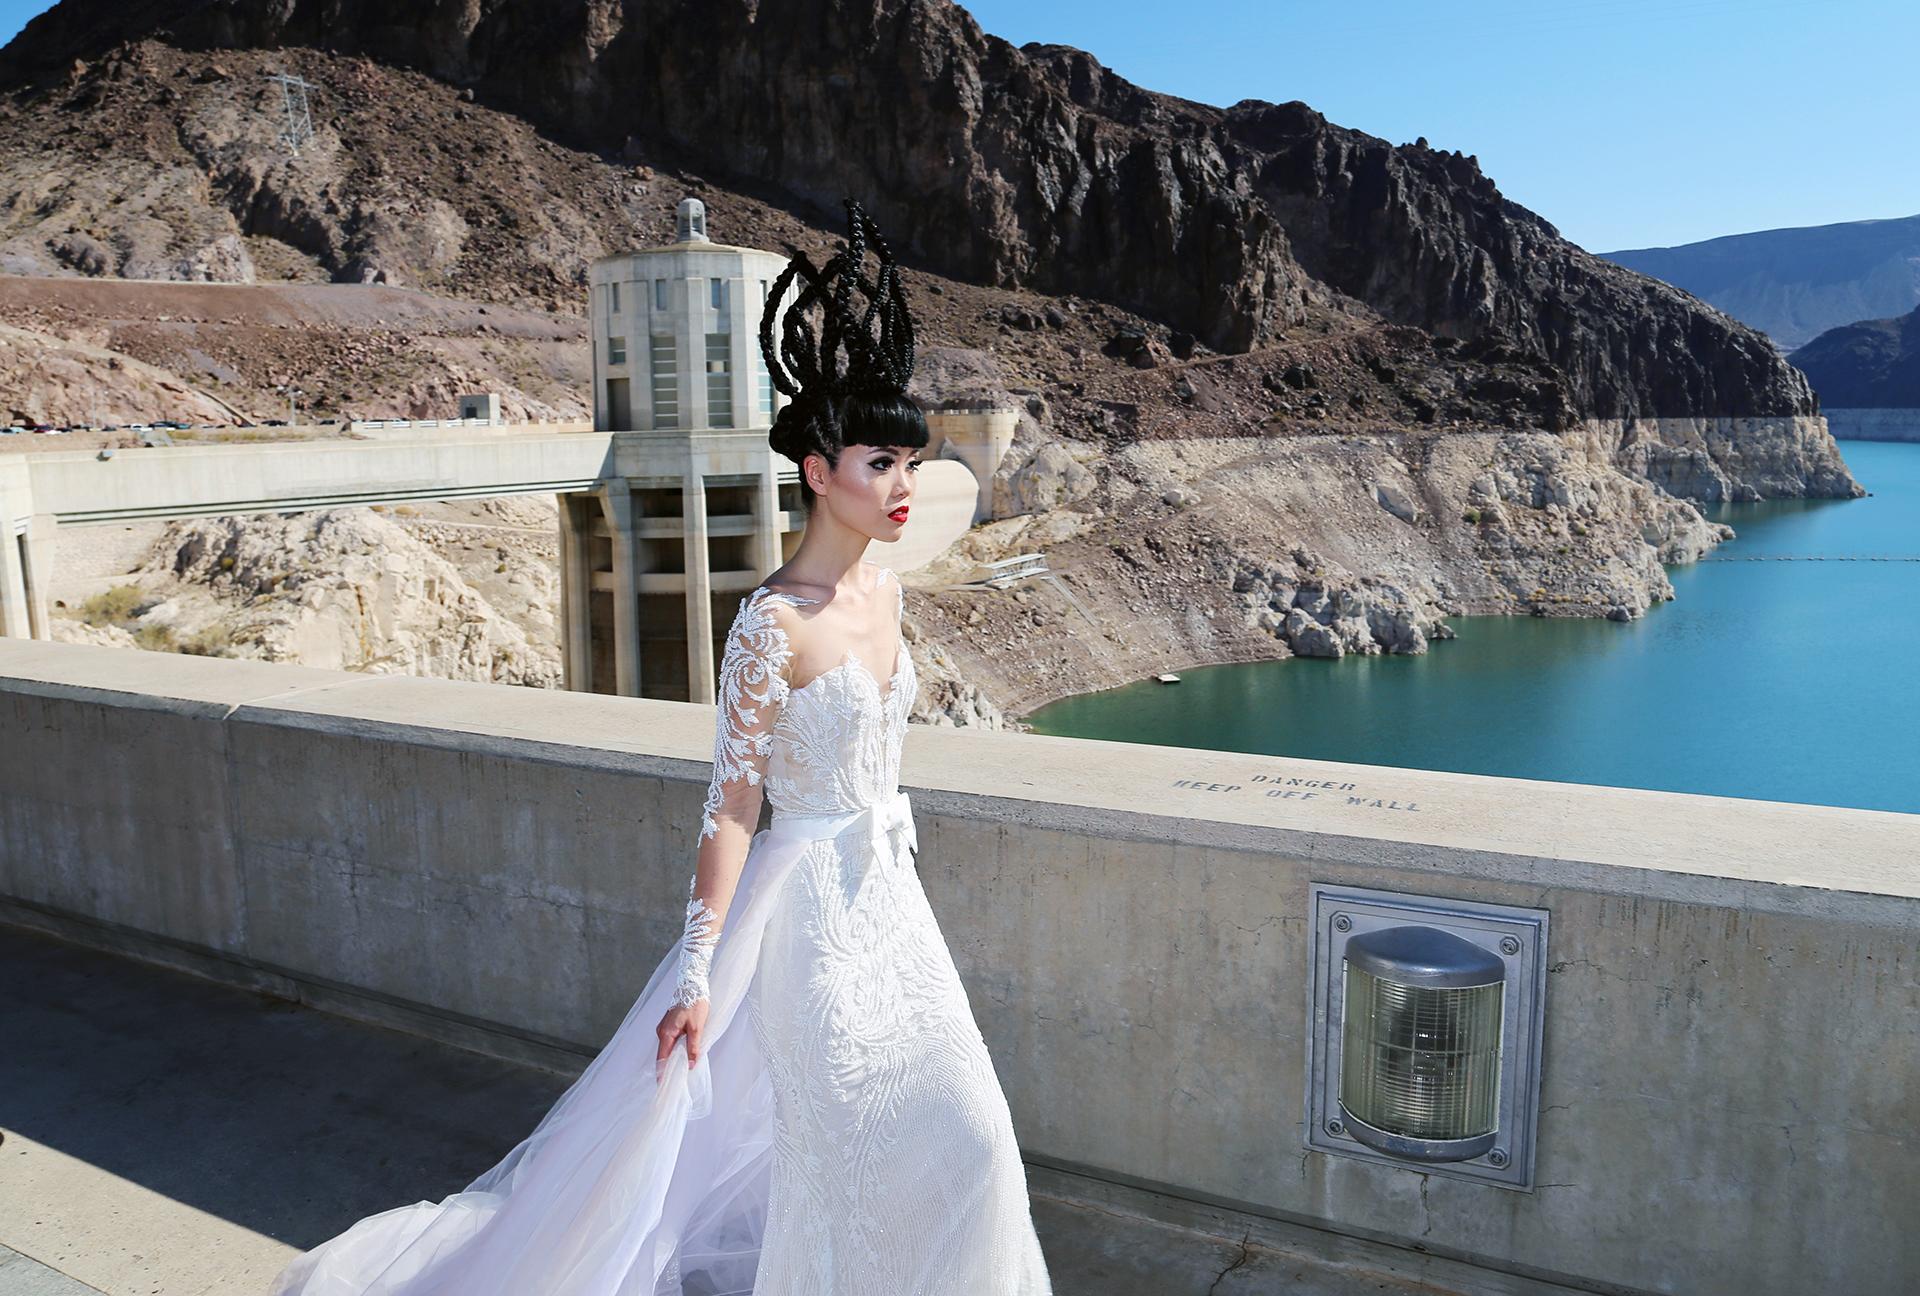 Emmanuel haute couture penang wedding dresses bridal gowns designer cloth - Emmanuel haute couture ...